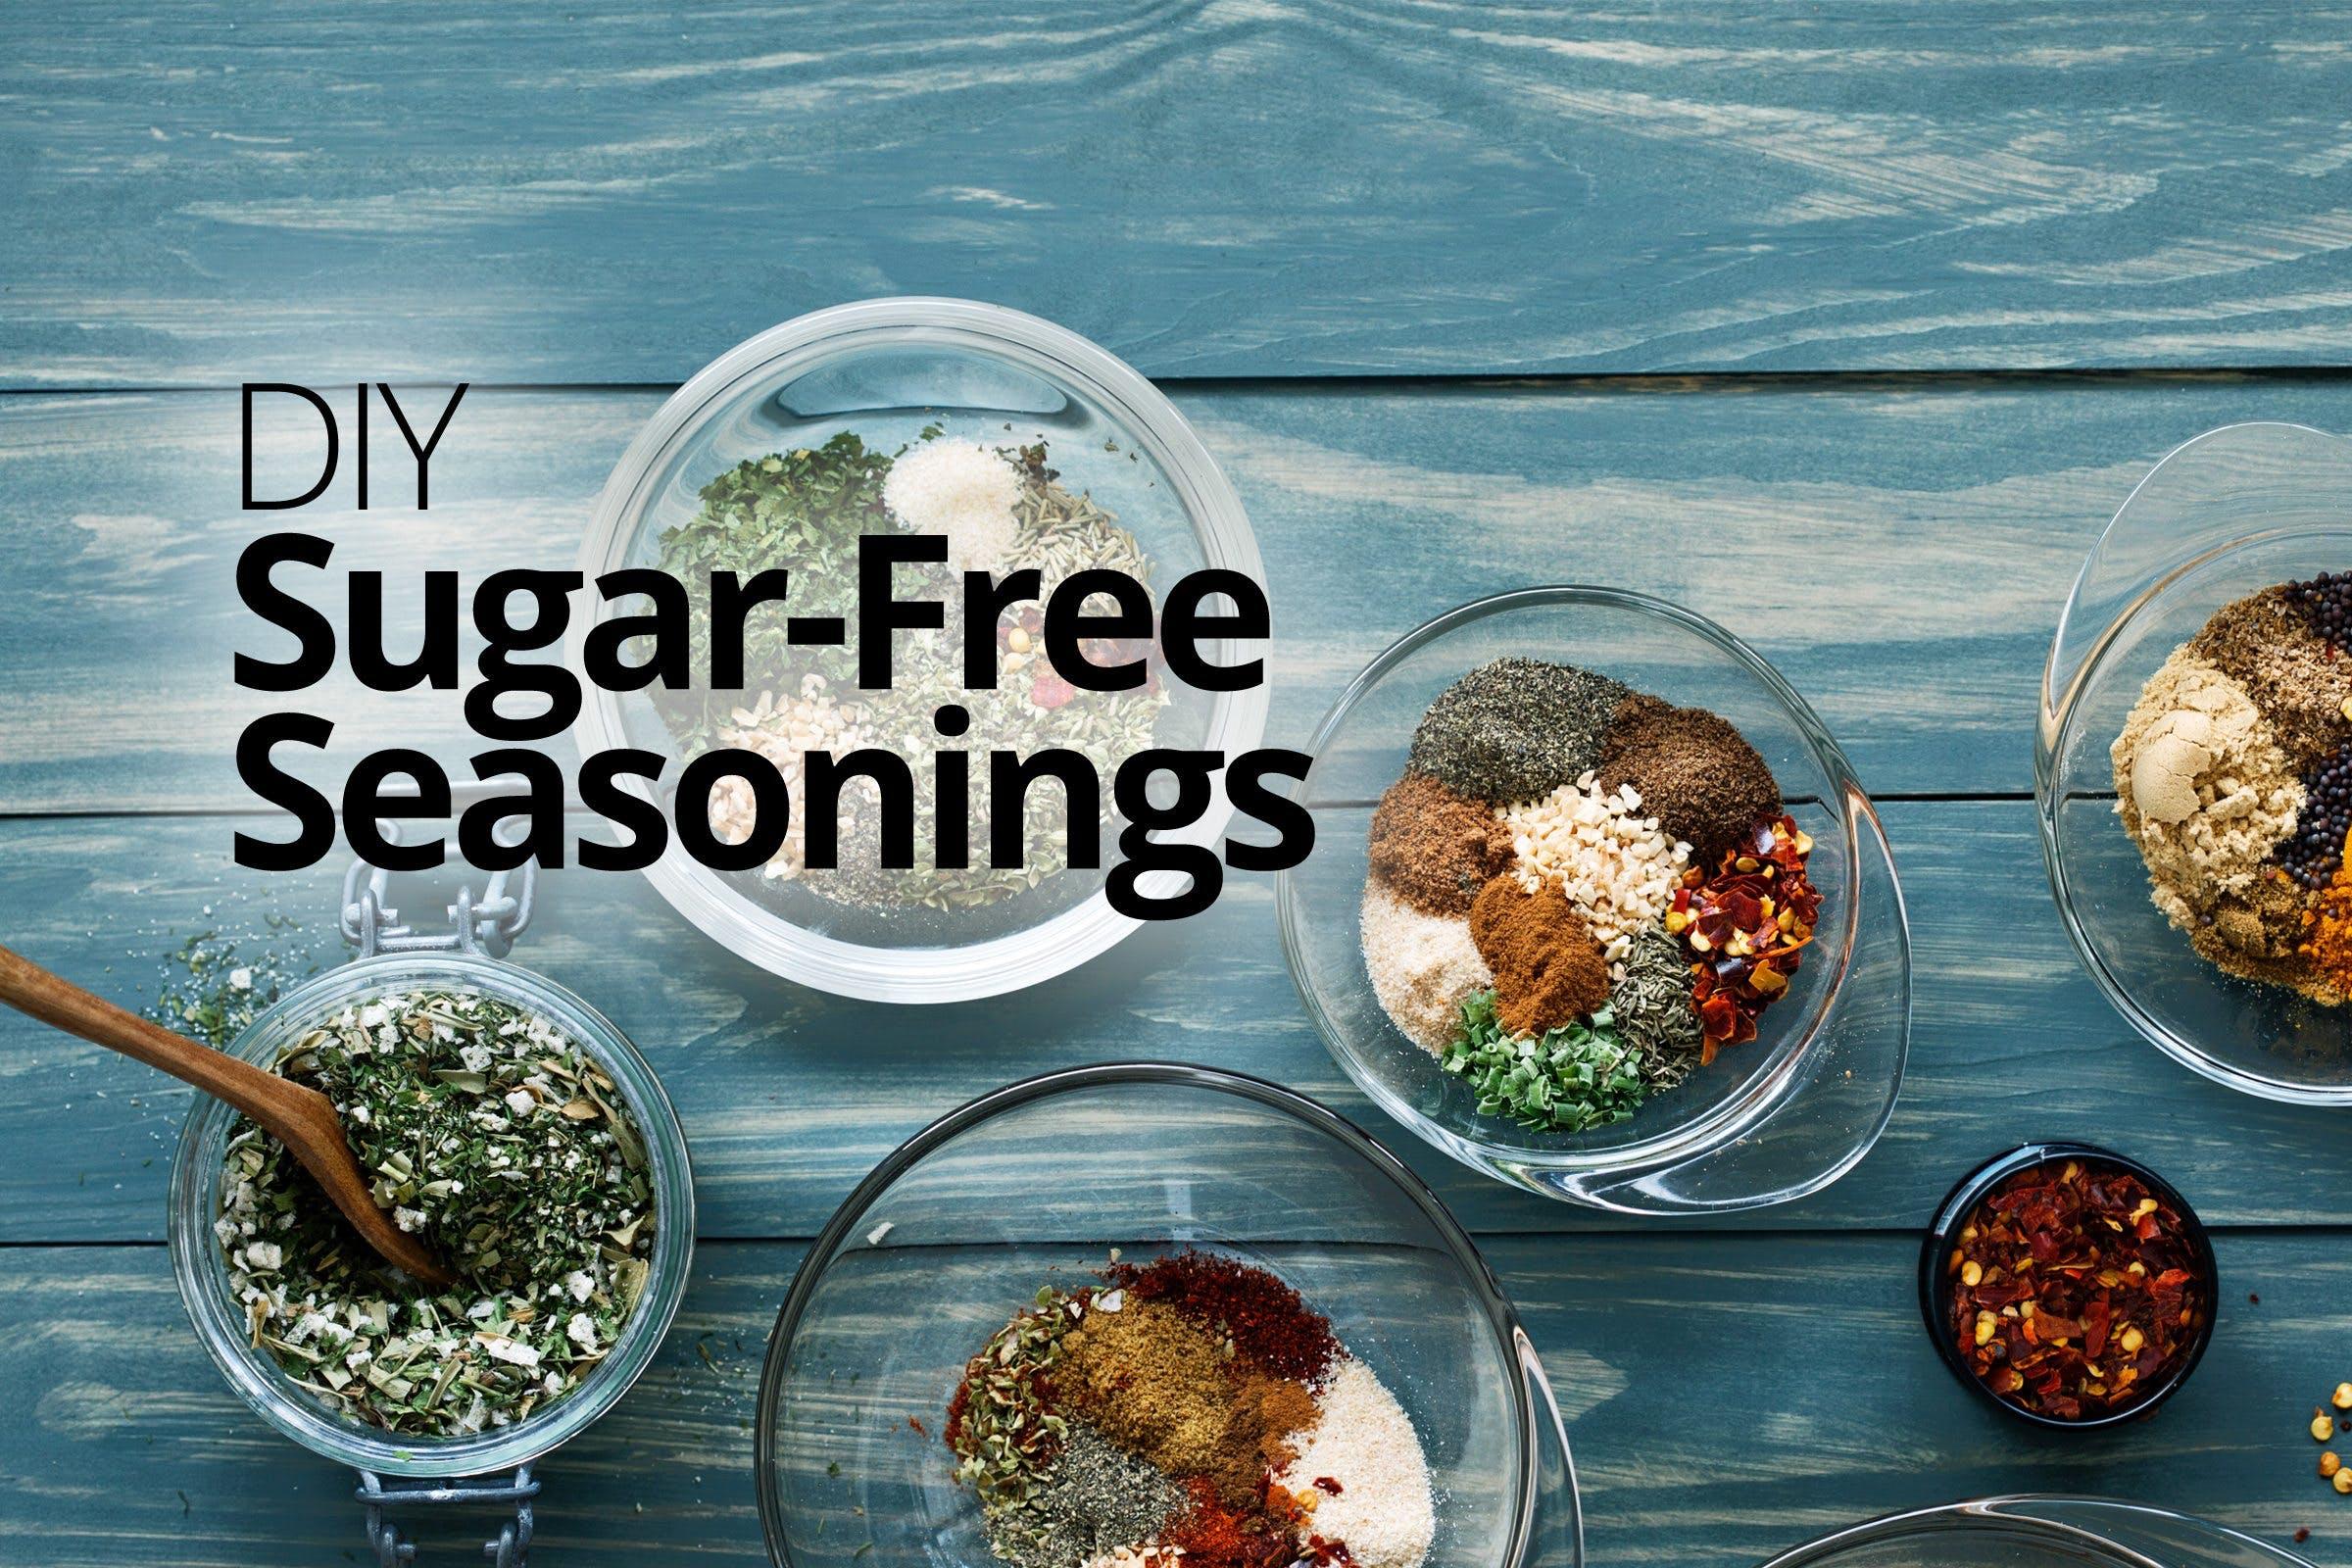 DIY sugar-free seasonings